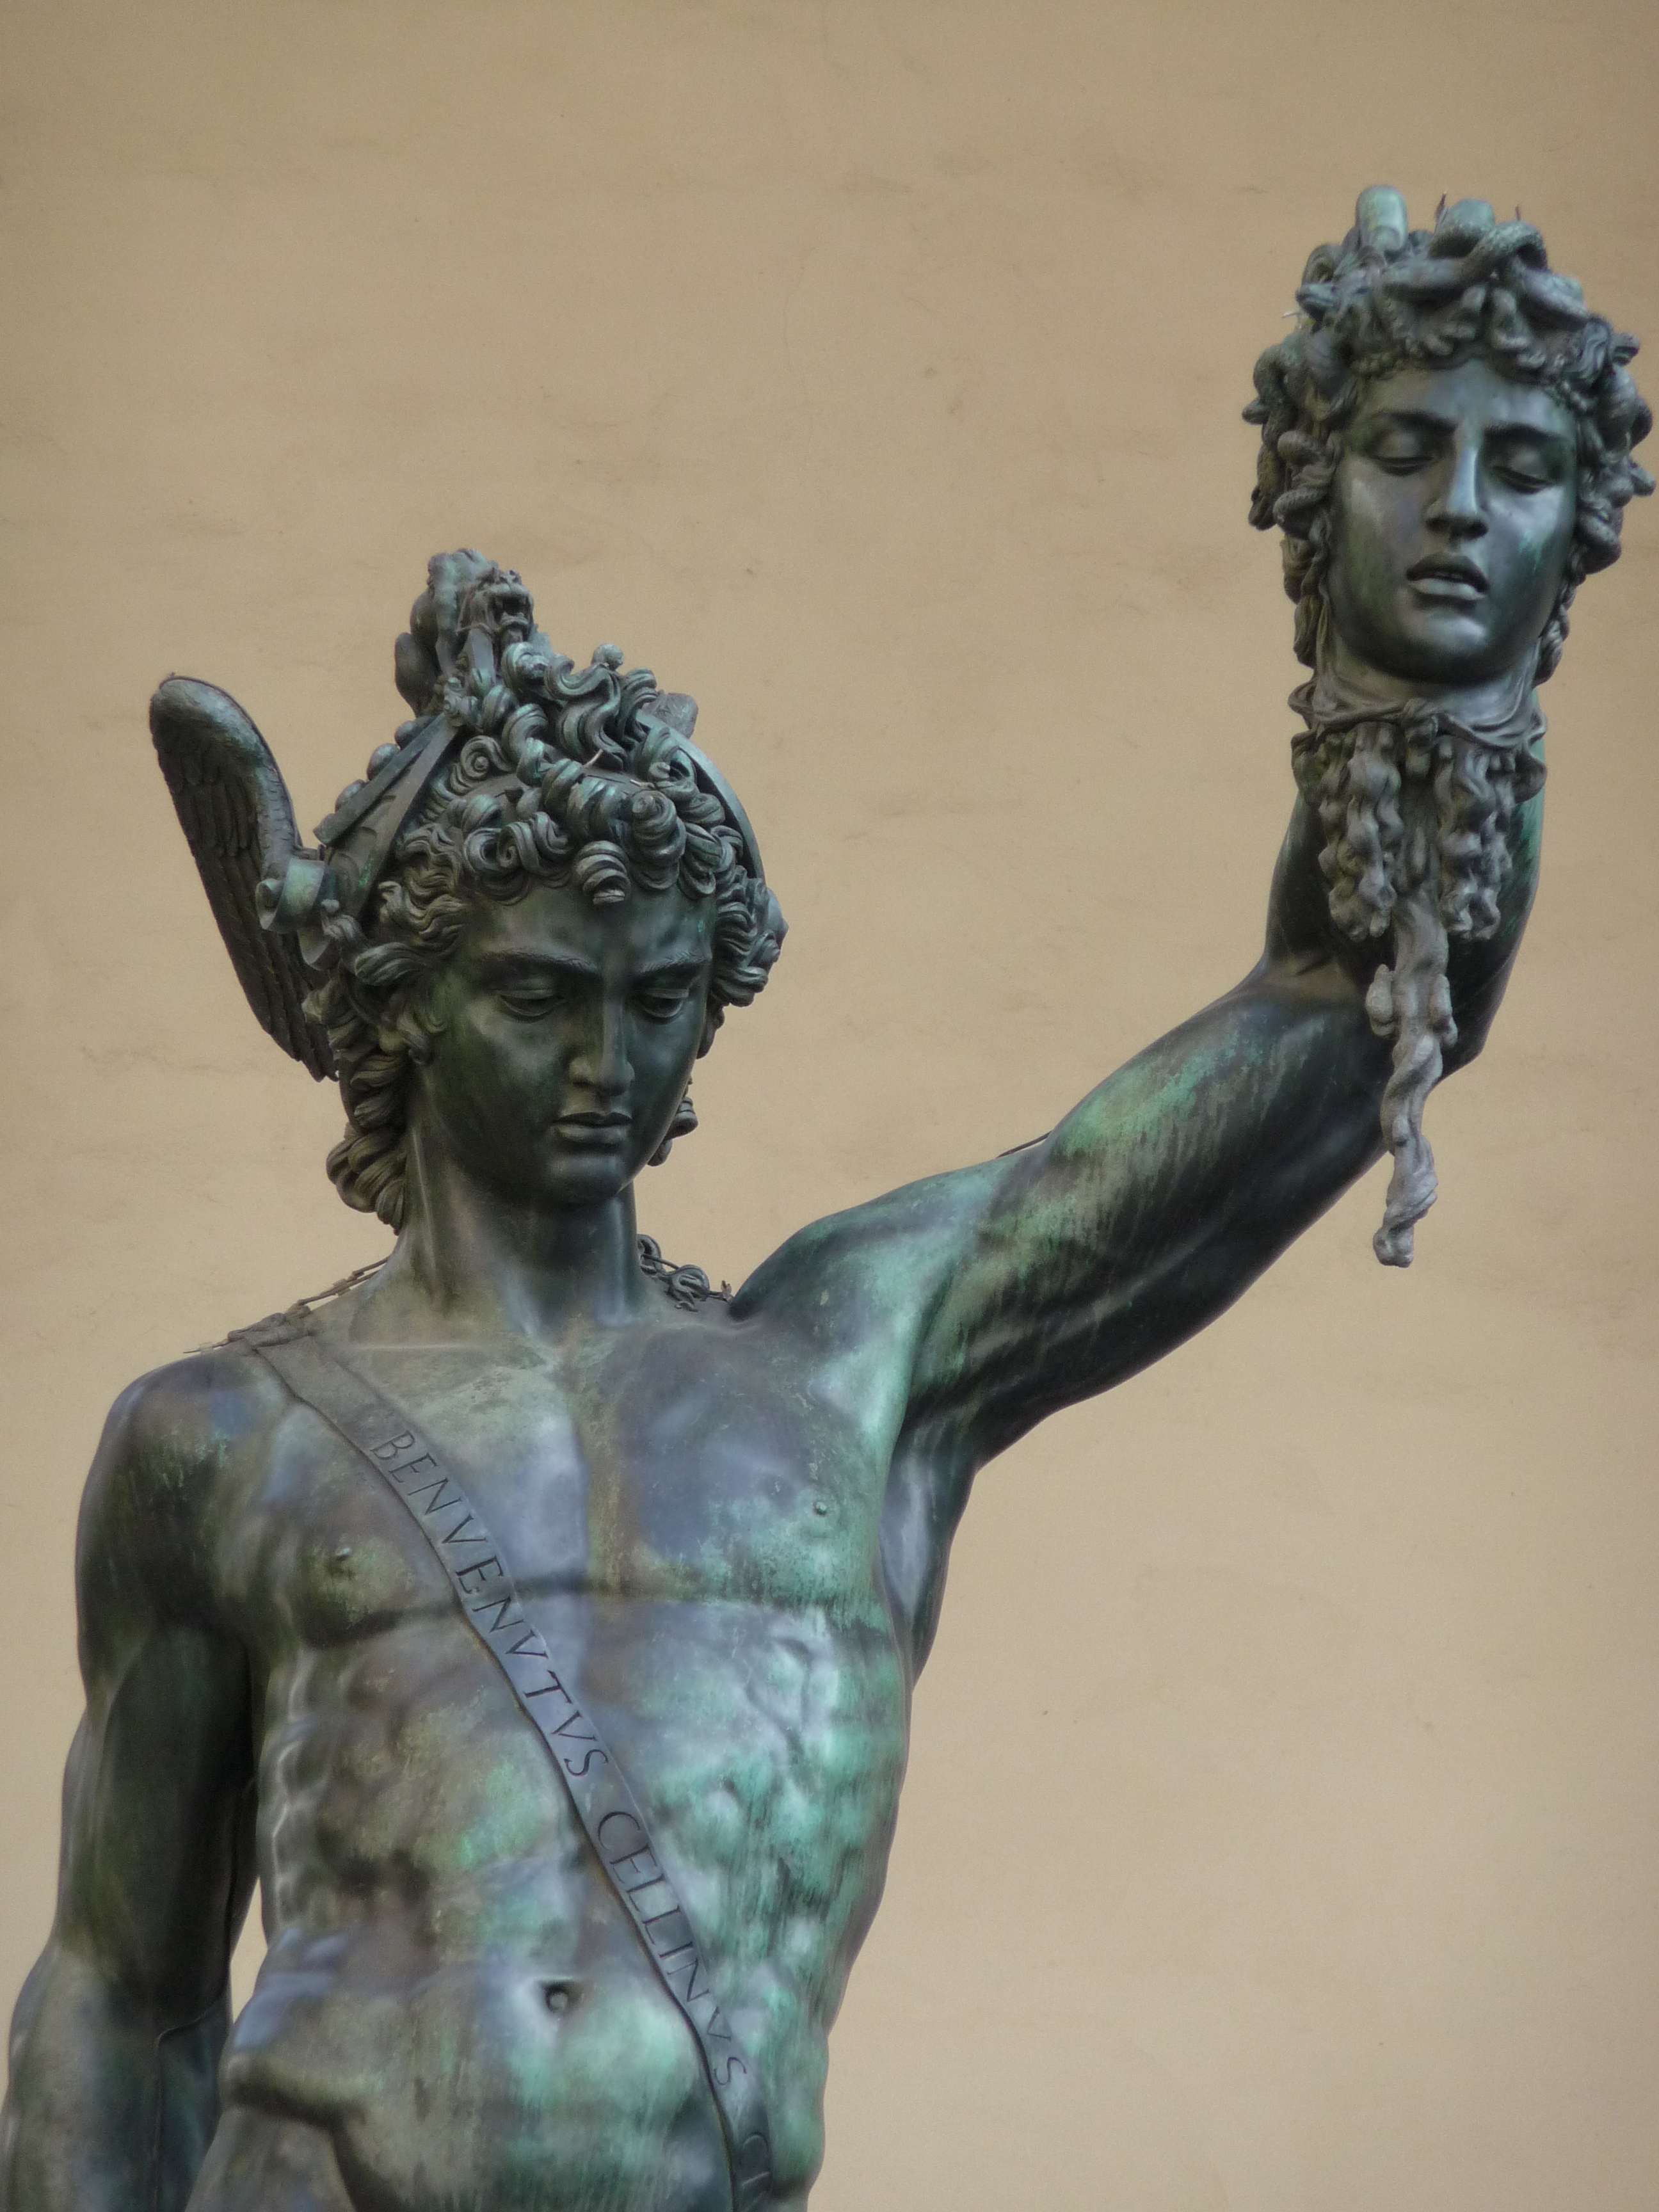 Perseus mit dem Haupt der Medusa. Bild: Jörg Bittner Unna. Lizenz: Creative Commons BY 3.0.